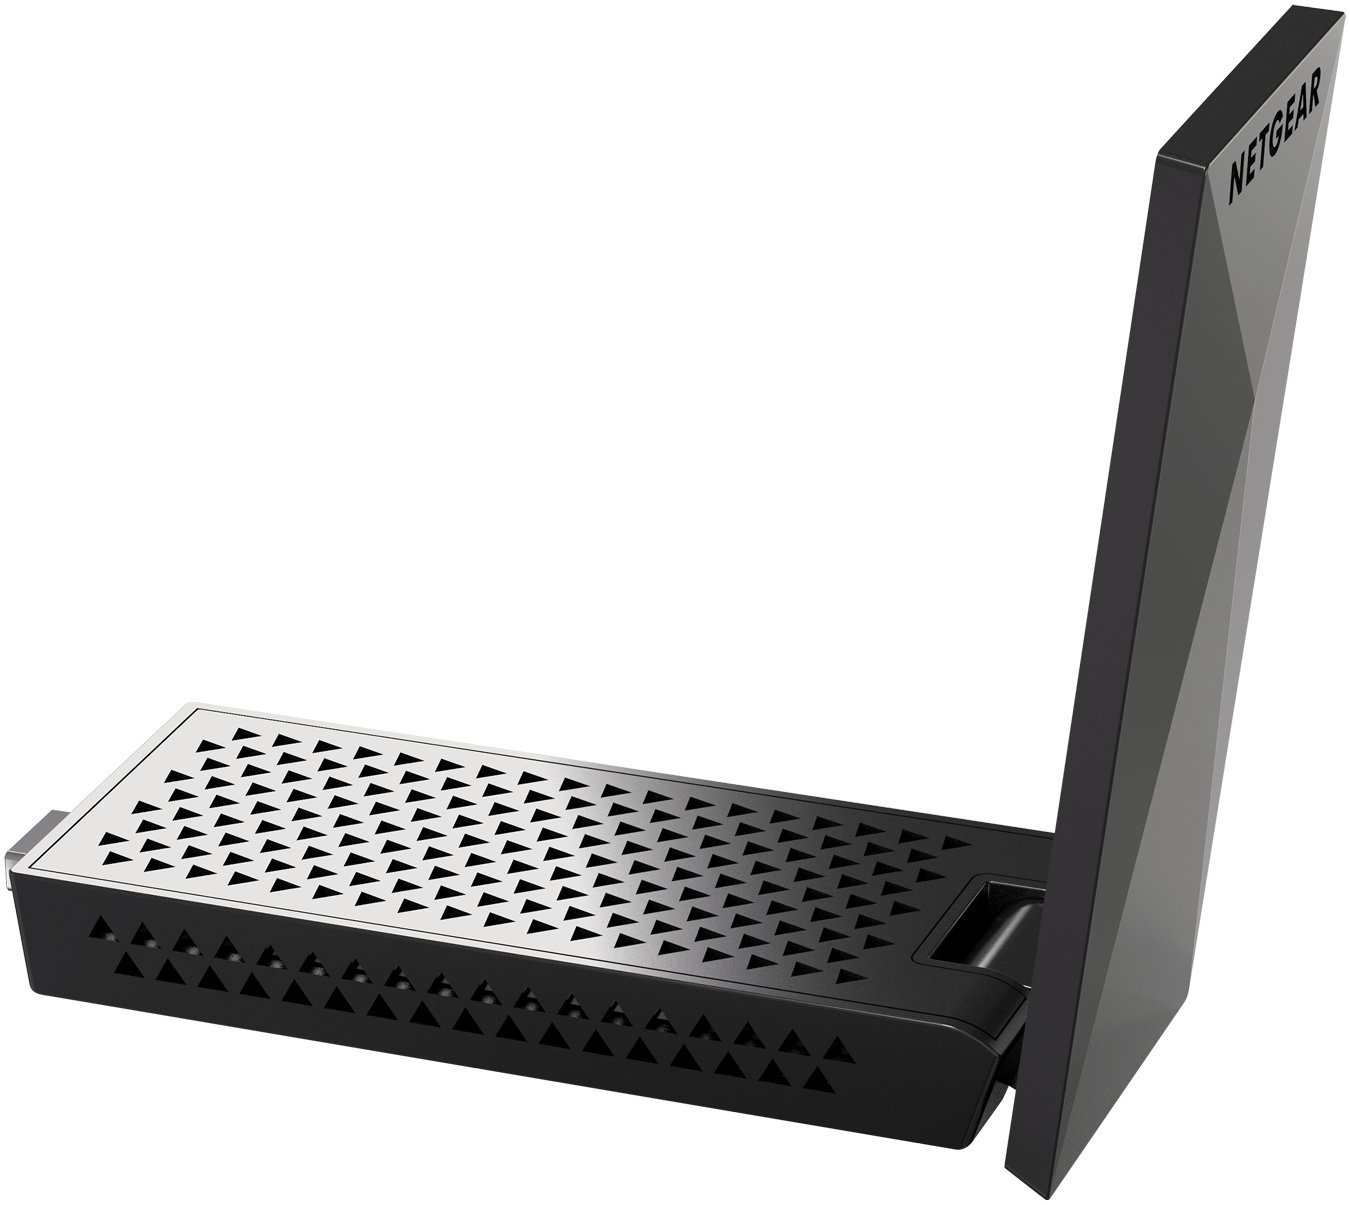 Netgear Nighthawk AC1900 Wi-Fi USB Adapter (A7000-10000S) by NETGEAR (Image #2)